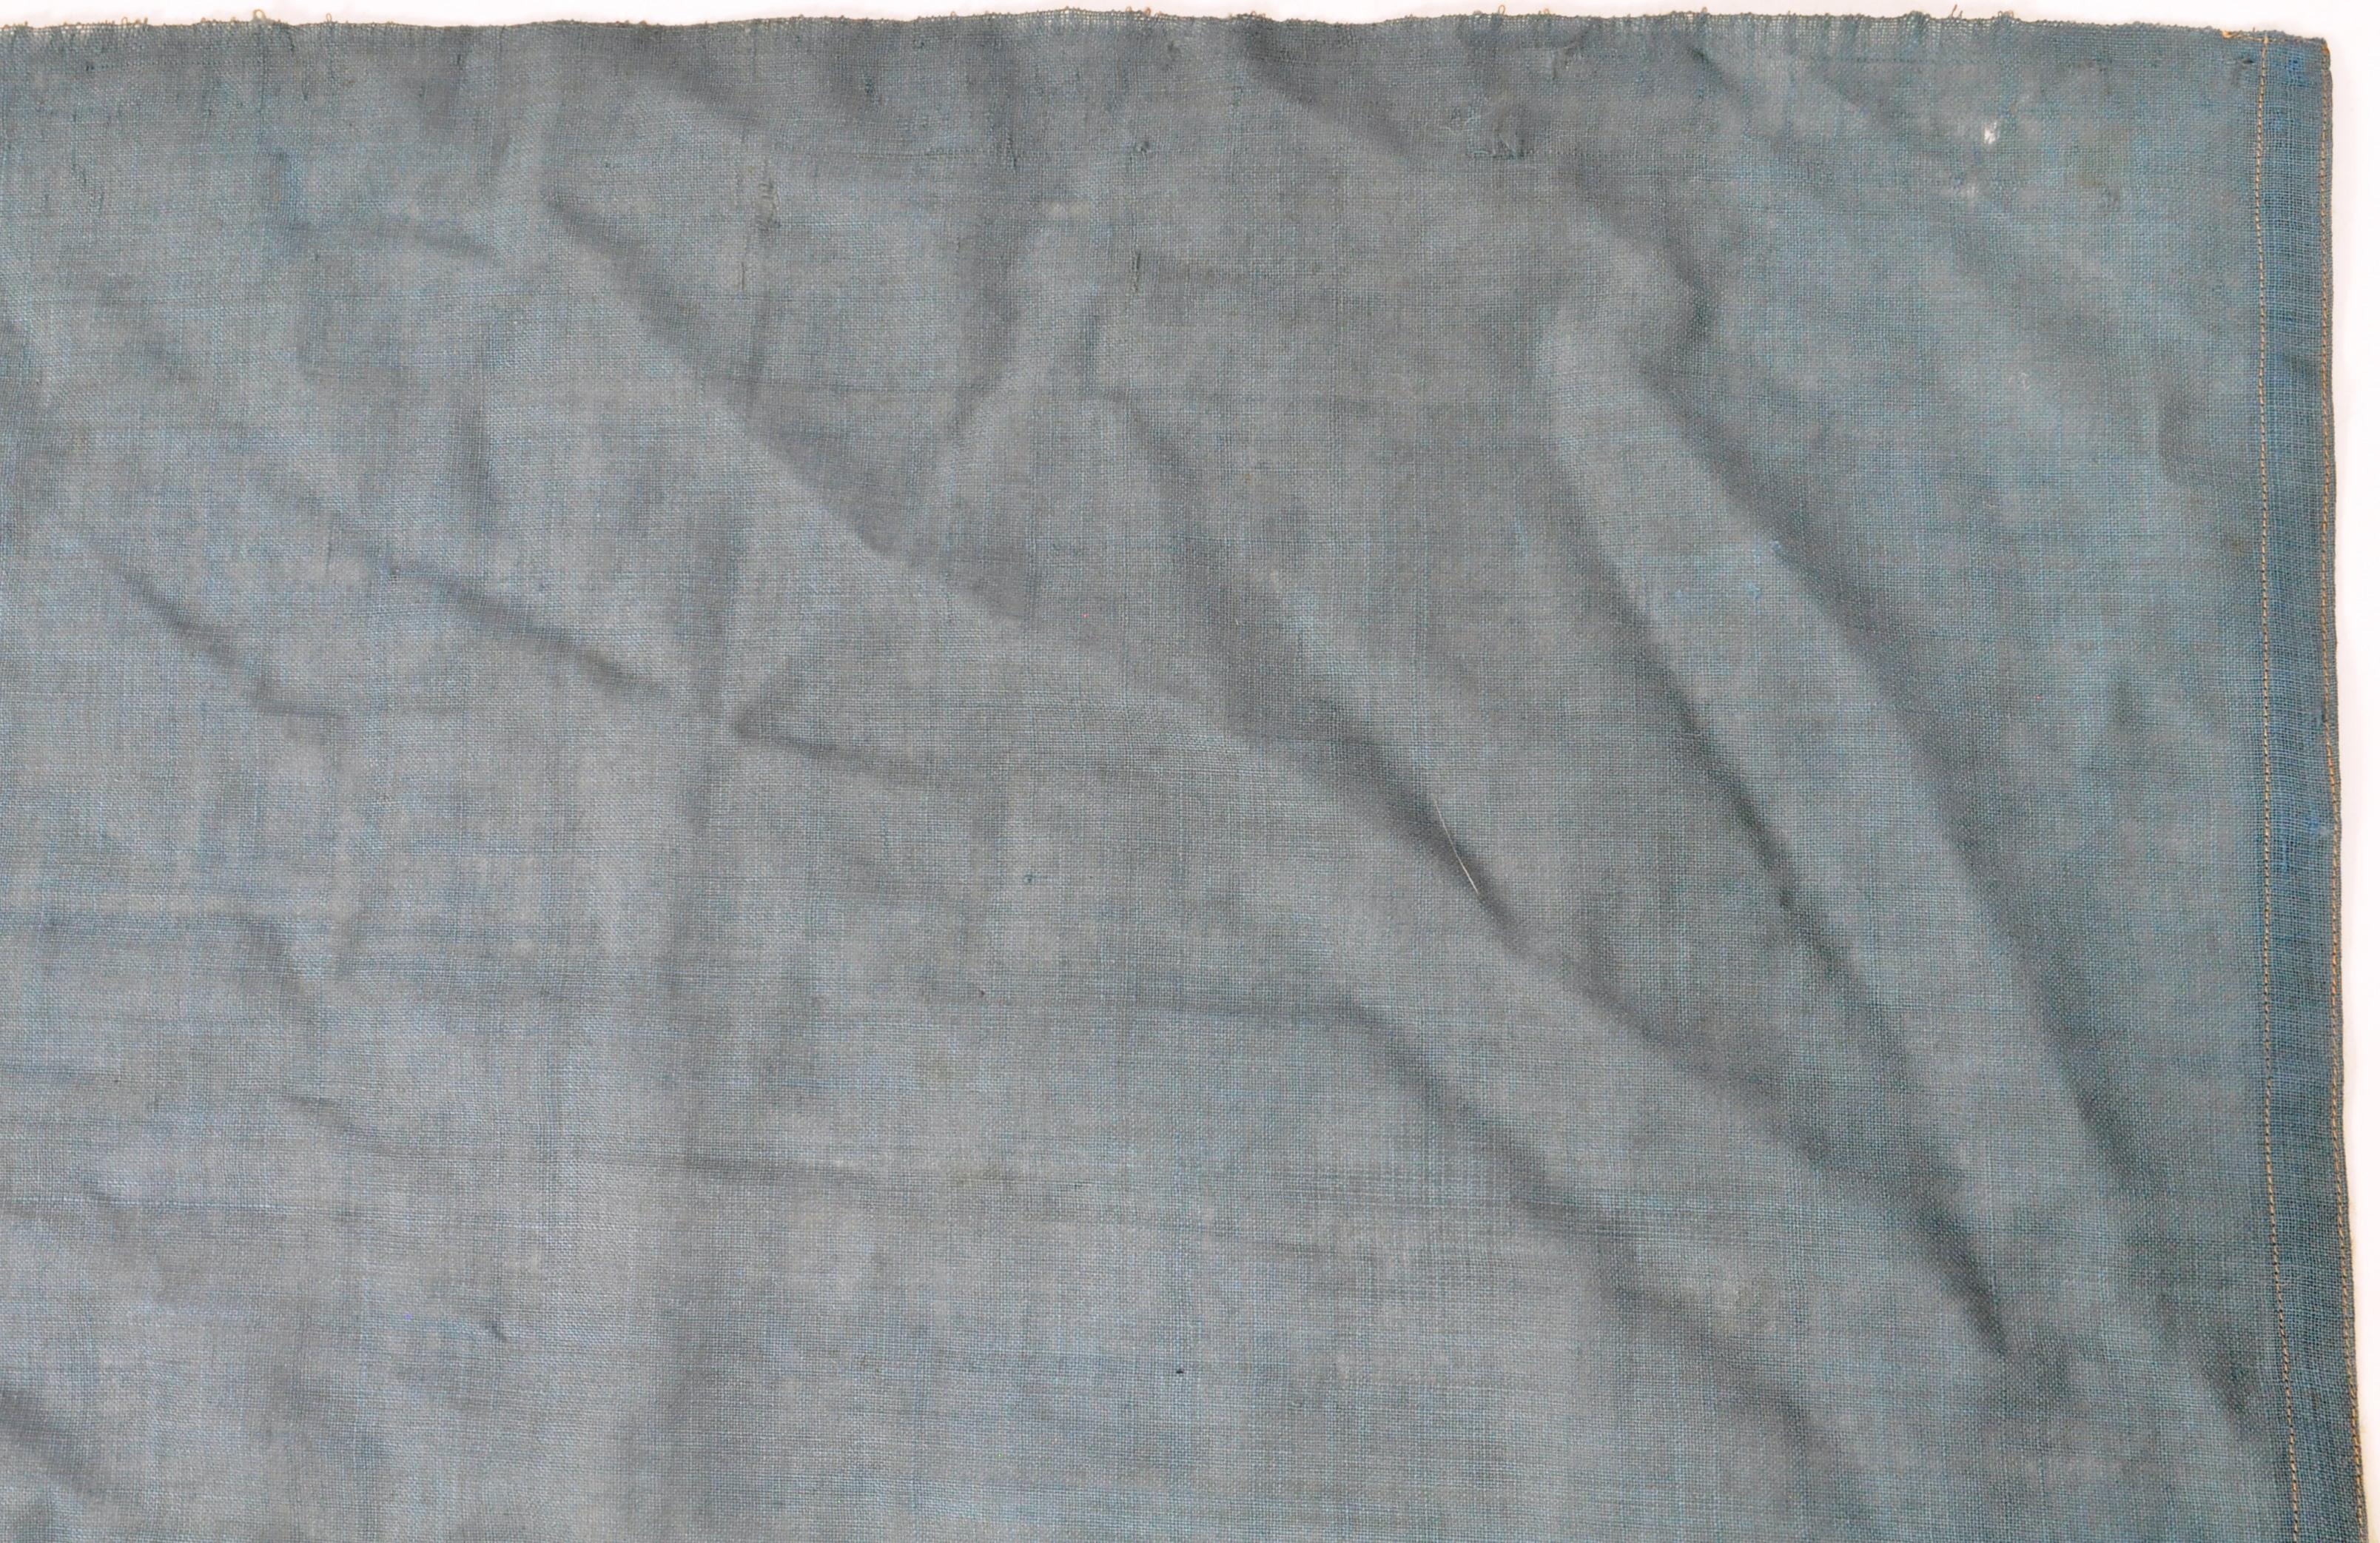 VINTAGE C1950S KOREAN WAR ERA UN UNITED NATIONS FLAG - Image 5 of 6